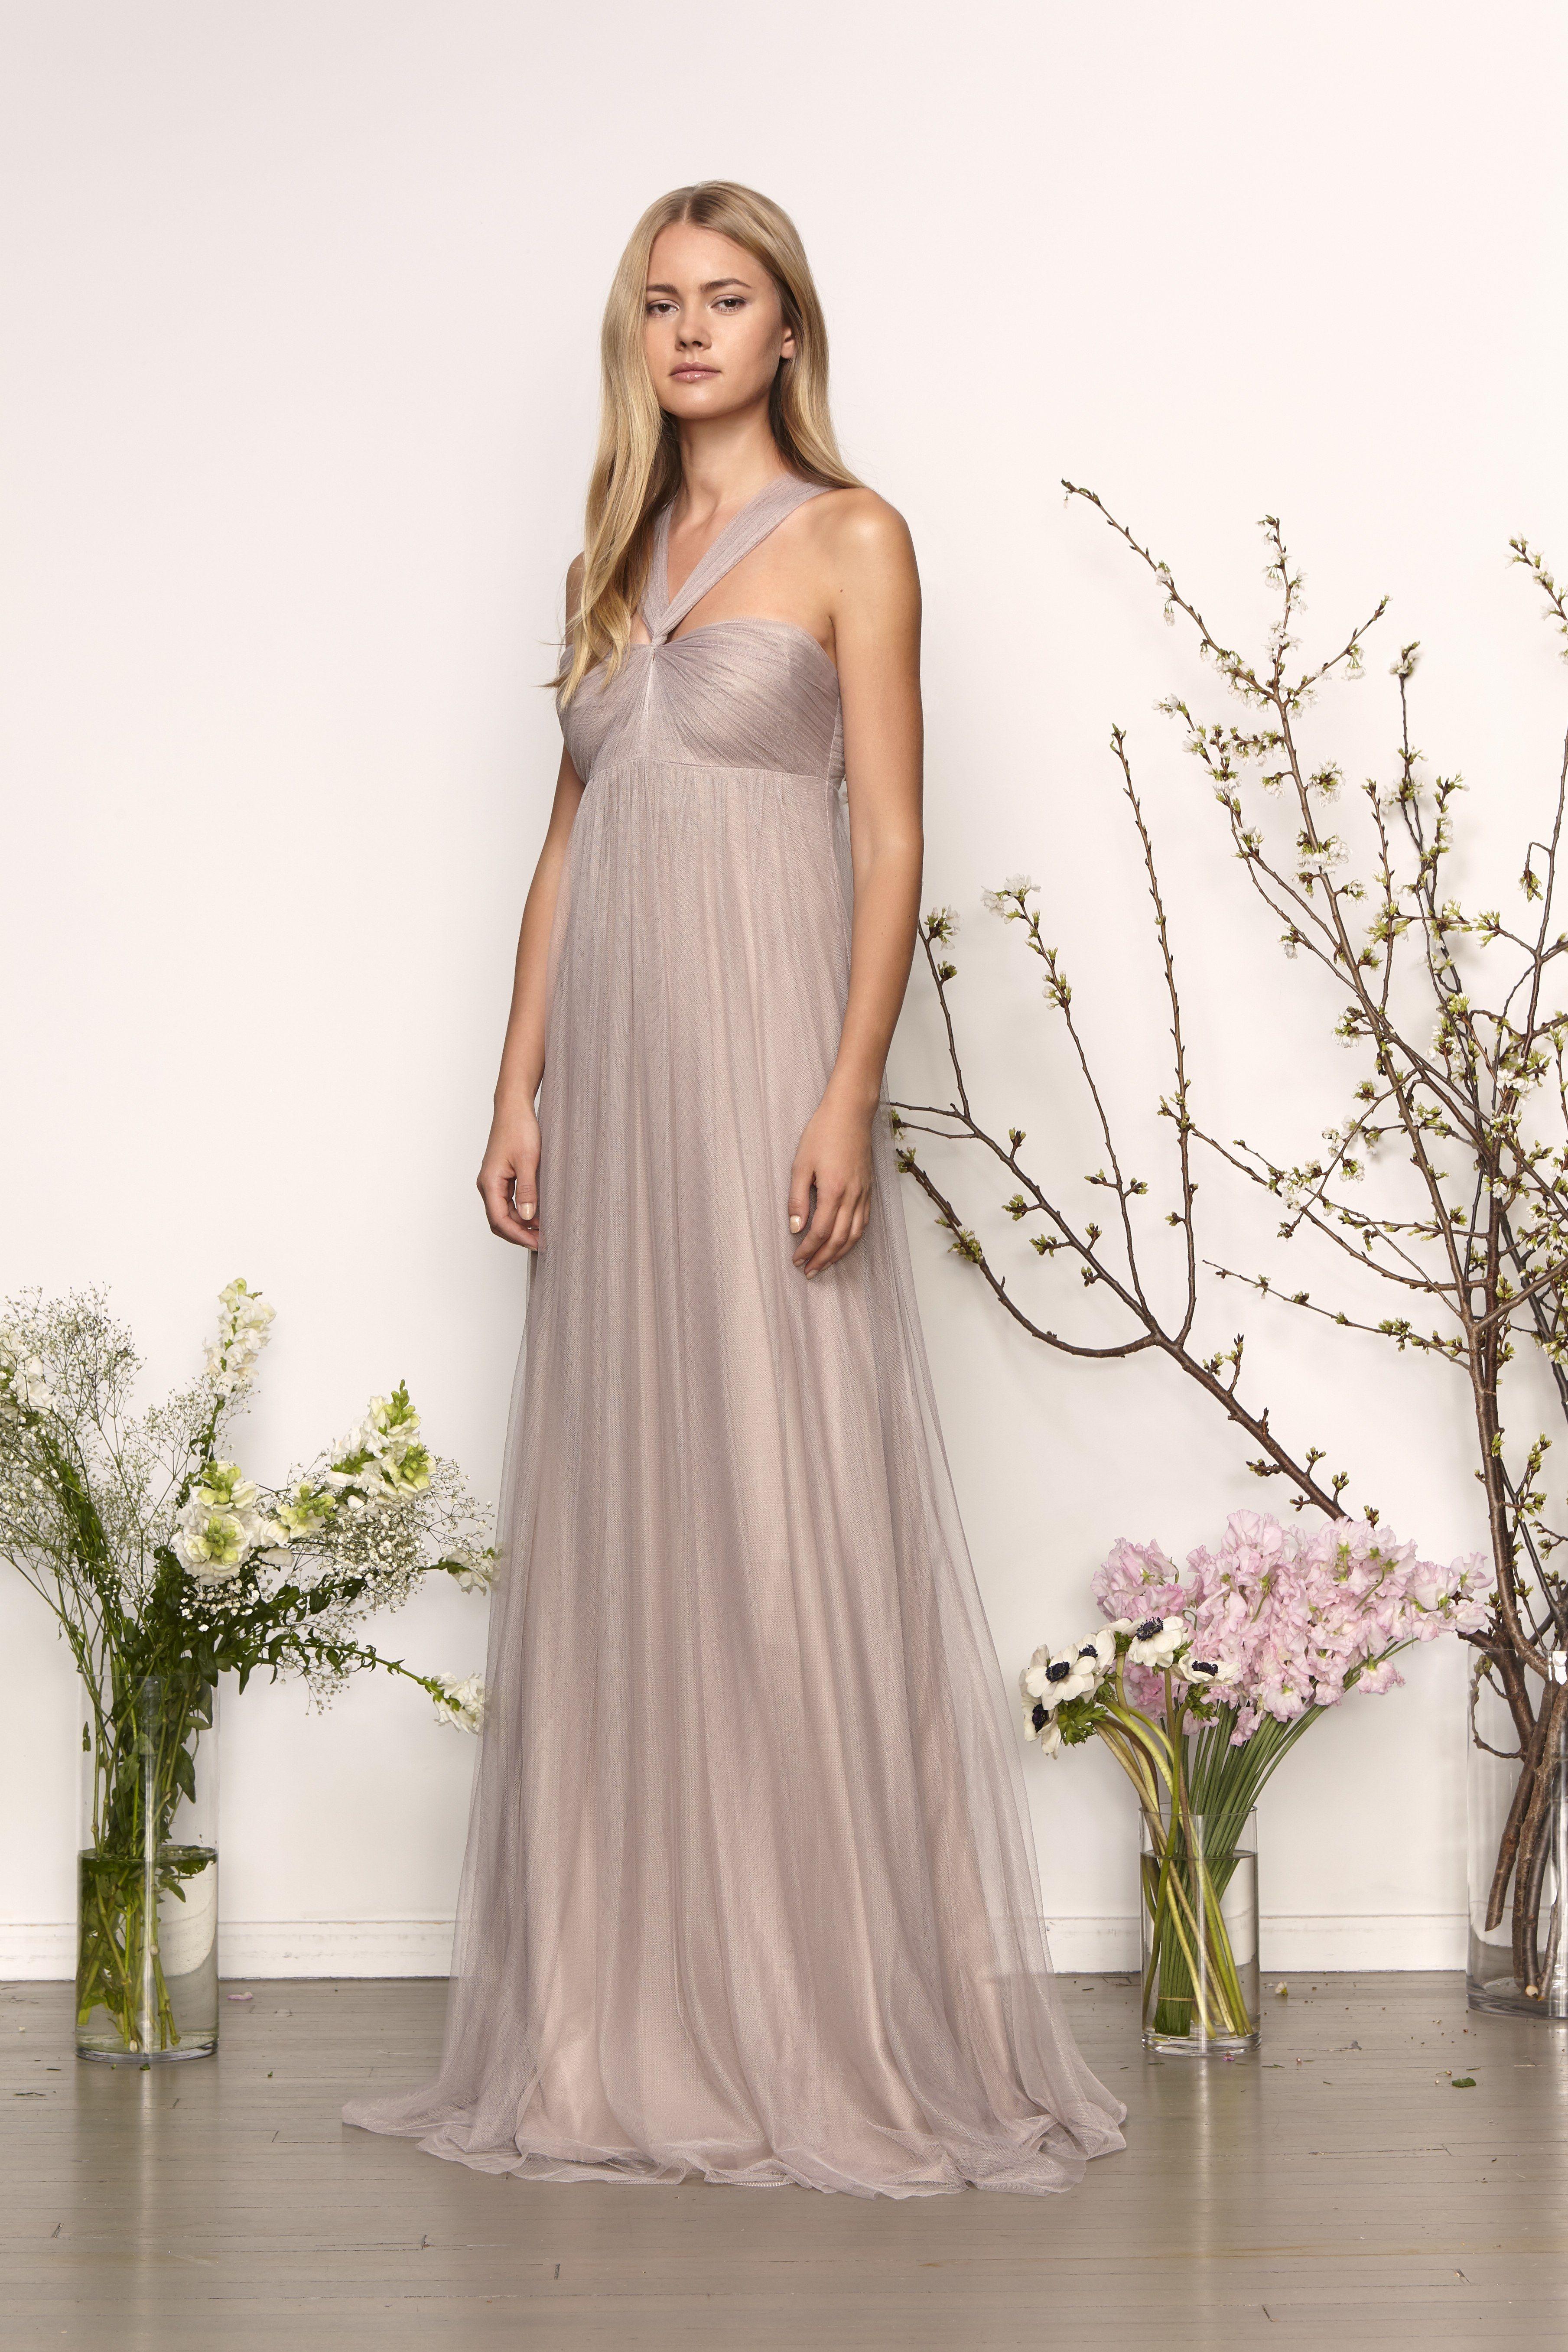 7074b615843f 25 Maternity Bridesmaids Dresses for Your Pregnant Bridesmaid | Brides